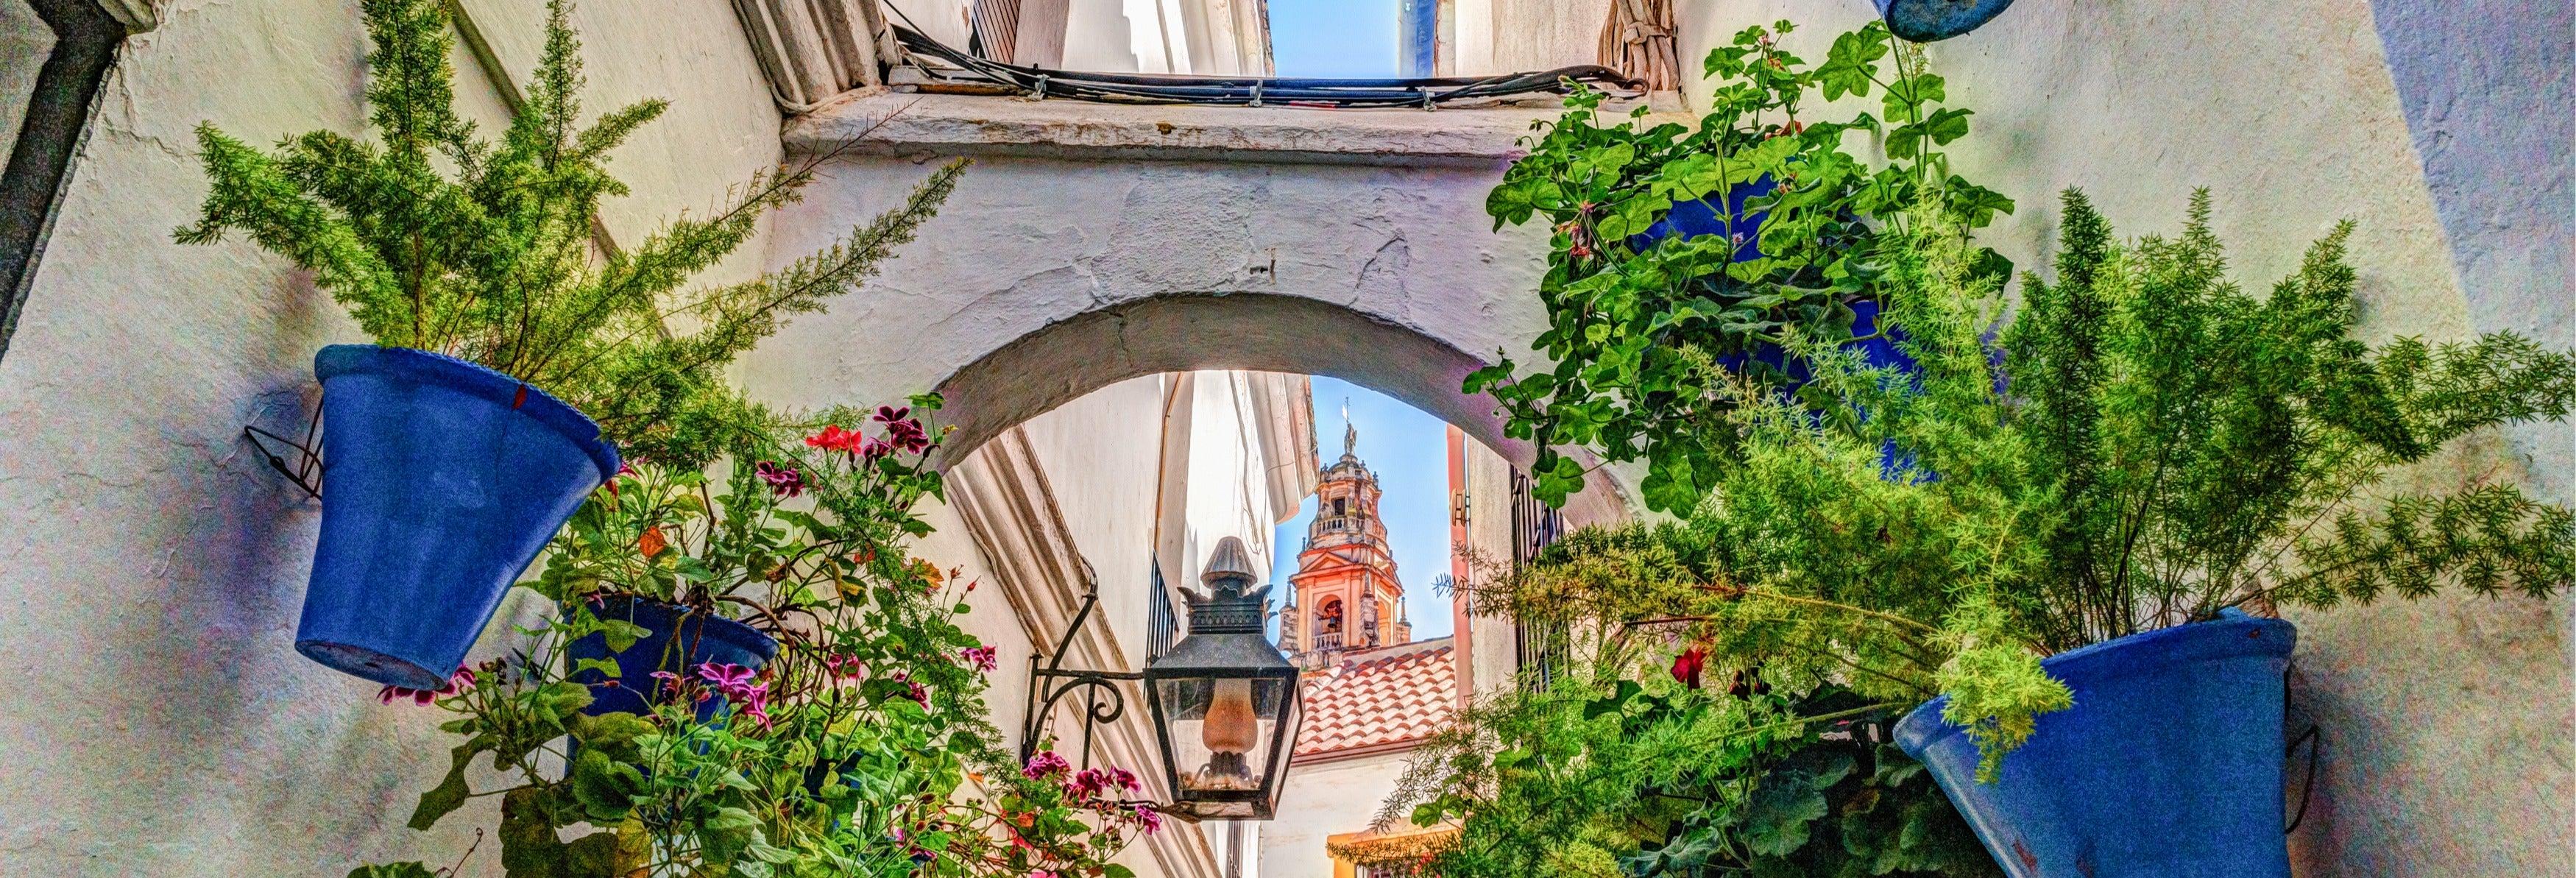 Excursão a Córdoba